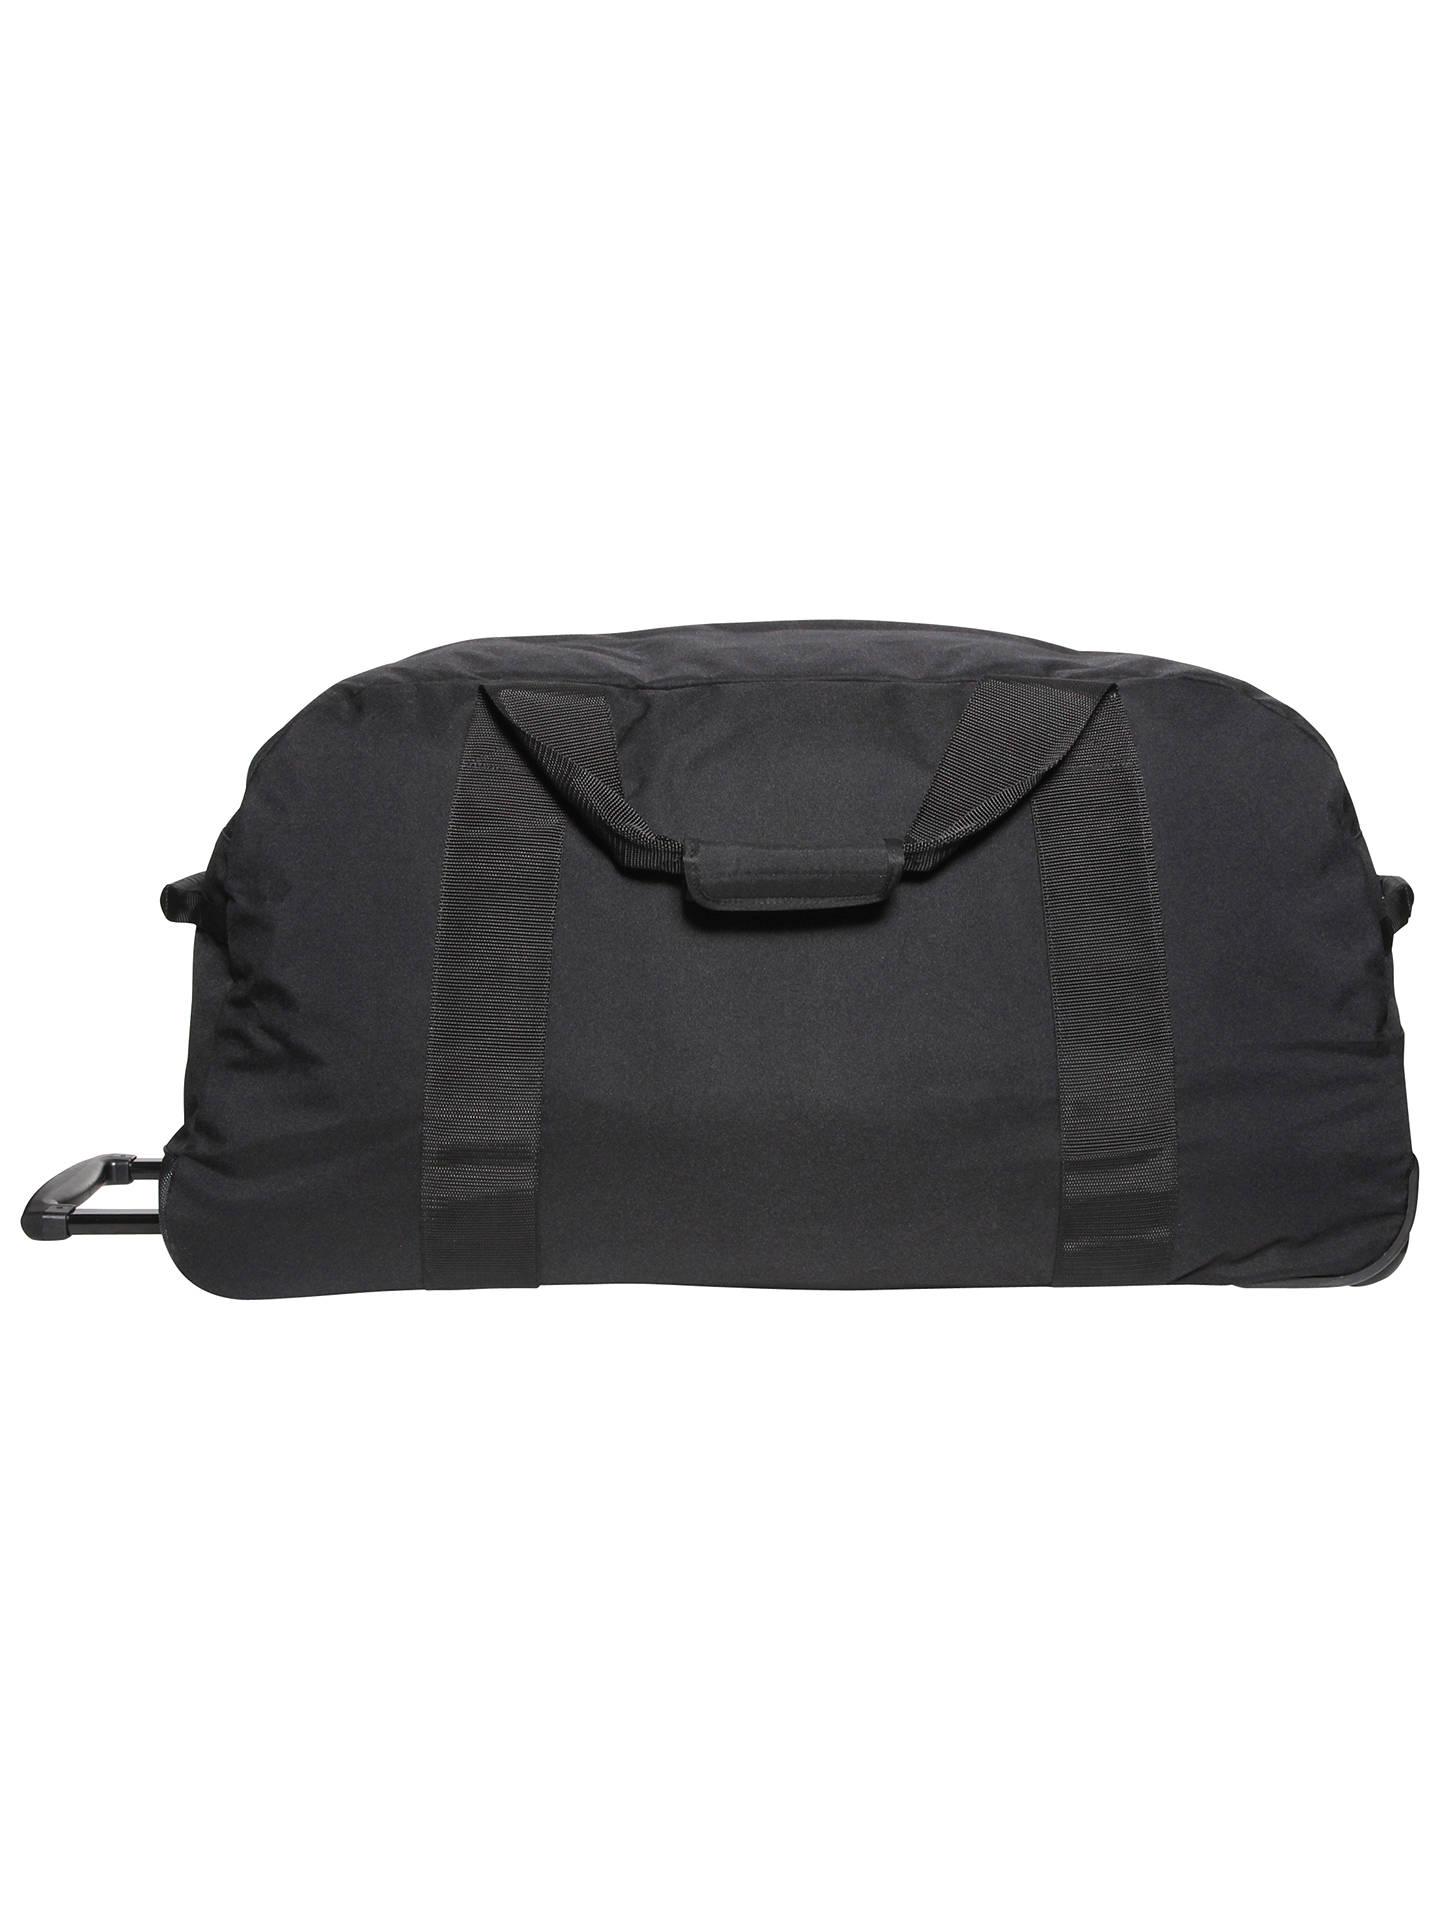 2ea53df6ec8 ... Buy Eastpak Container 85 Wheeled Duffle Bag, Black Online at  johnlewis.com